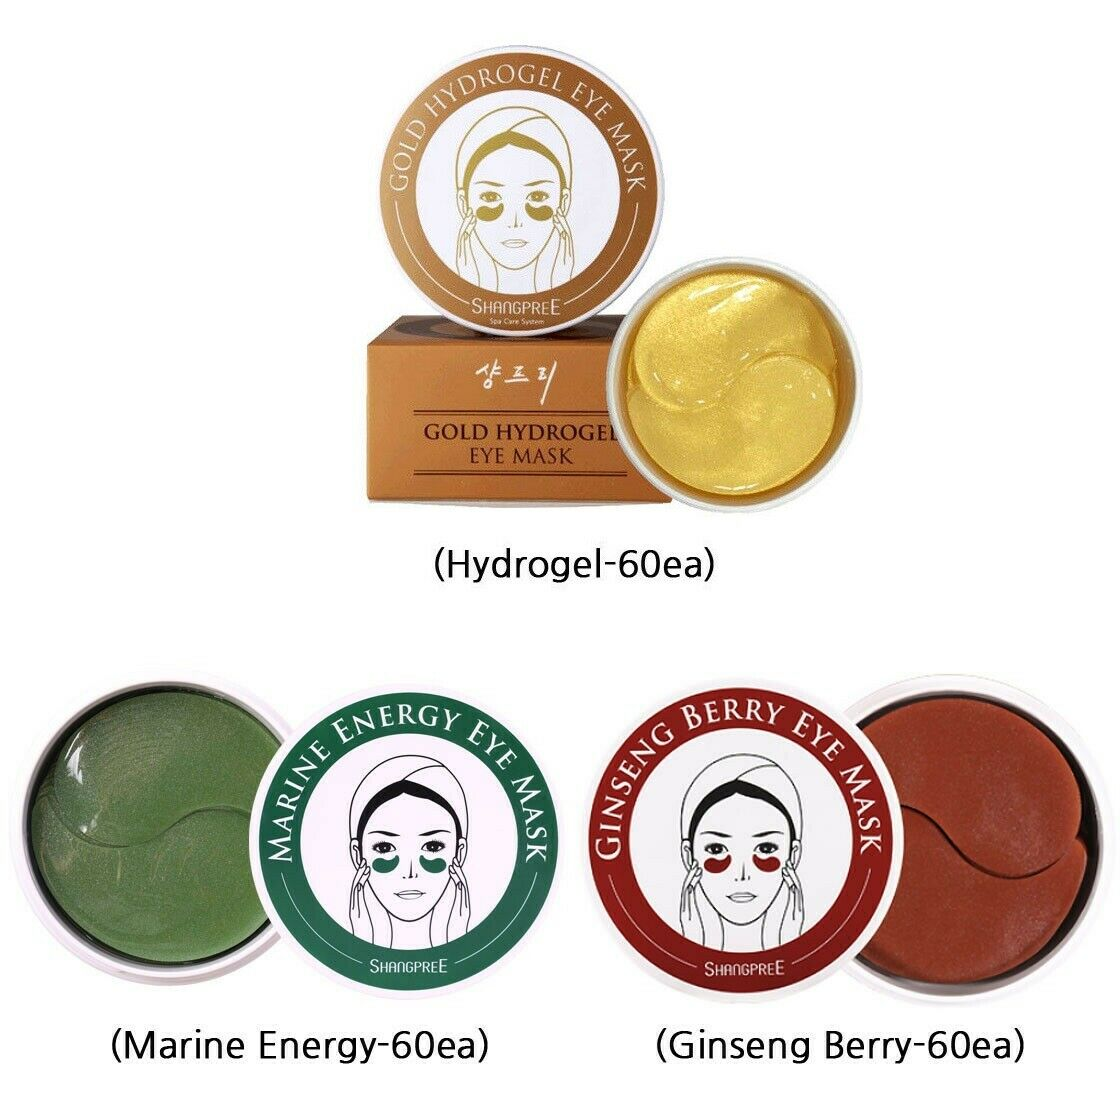 Korea Shangpree Ginseng Berry / Marine Energy / Gold Hydrogel Eye Mask Hydrating Under Eye Patch Pads Anti Wrinkles Dark Circle